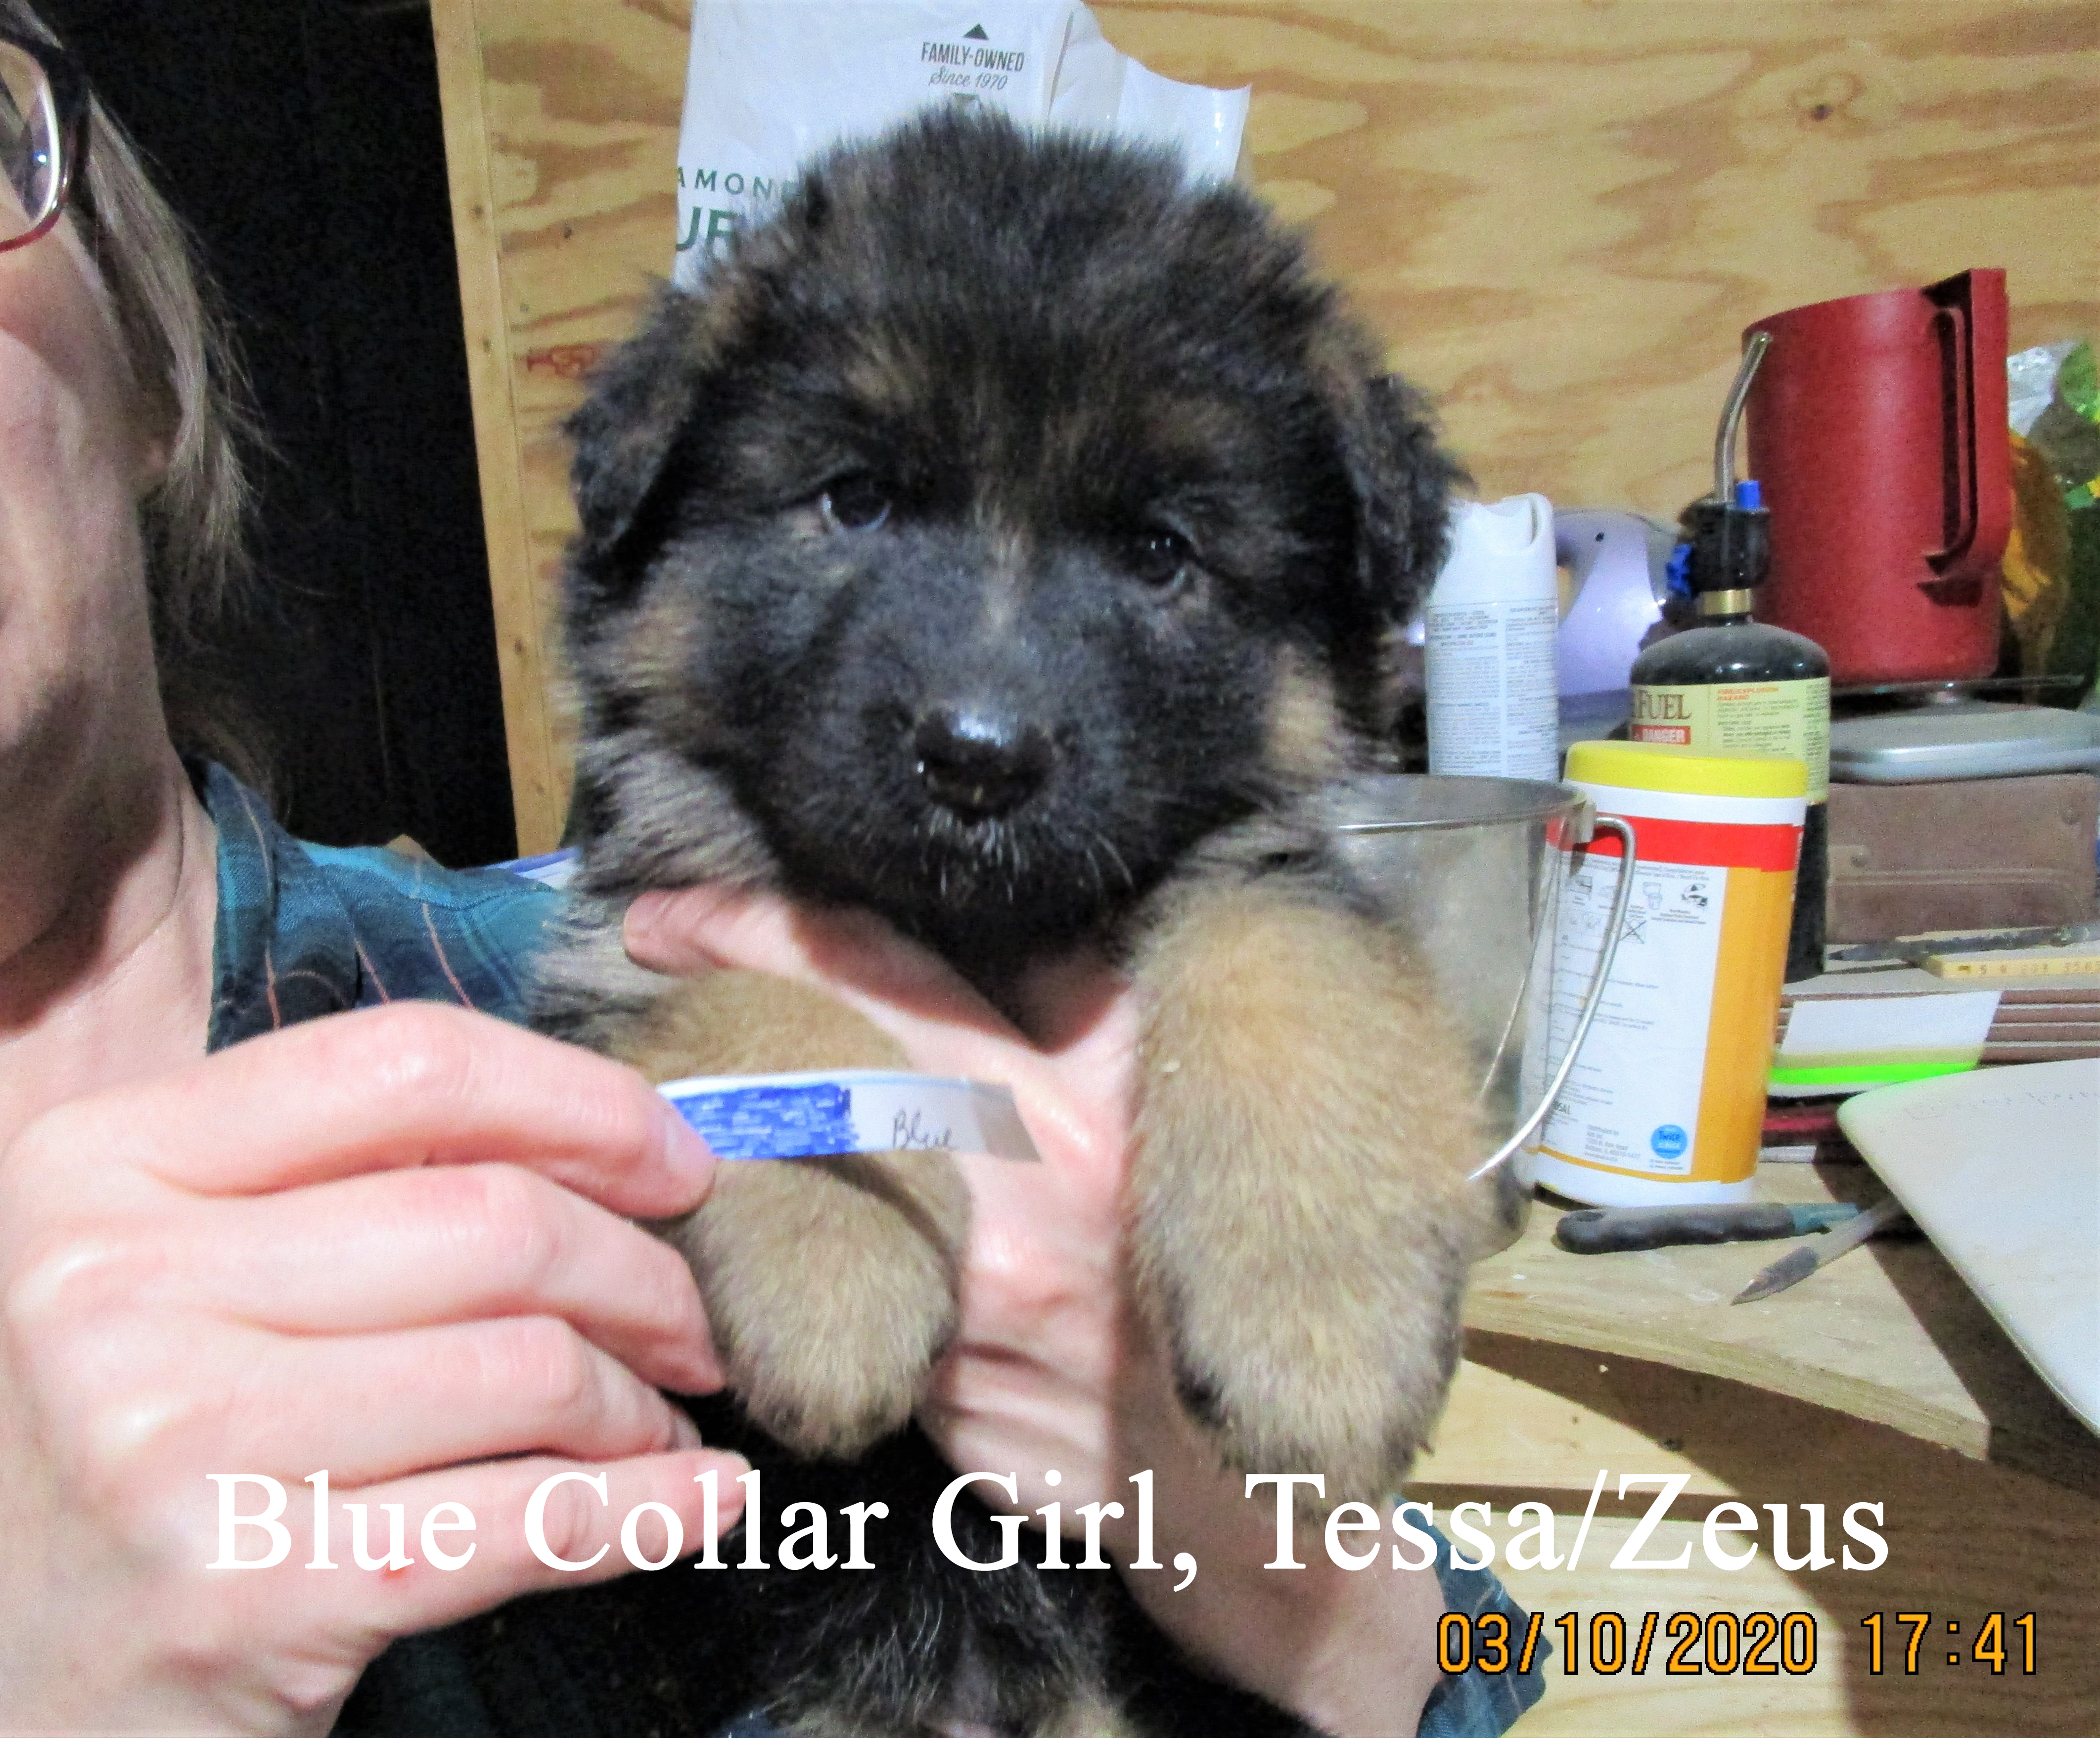 Blue Collar Girl, typed